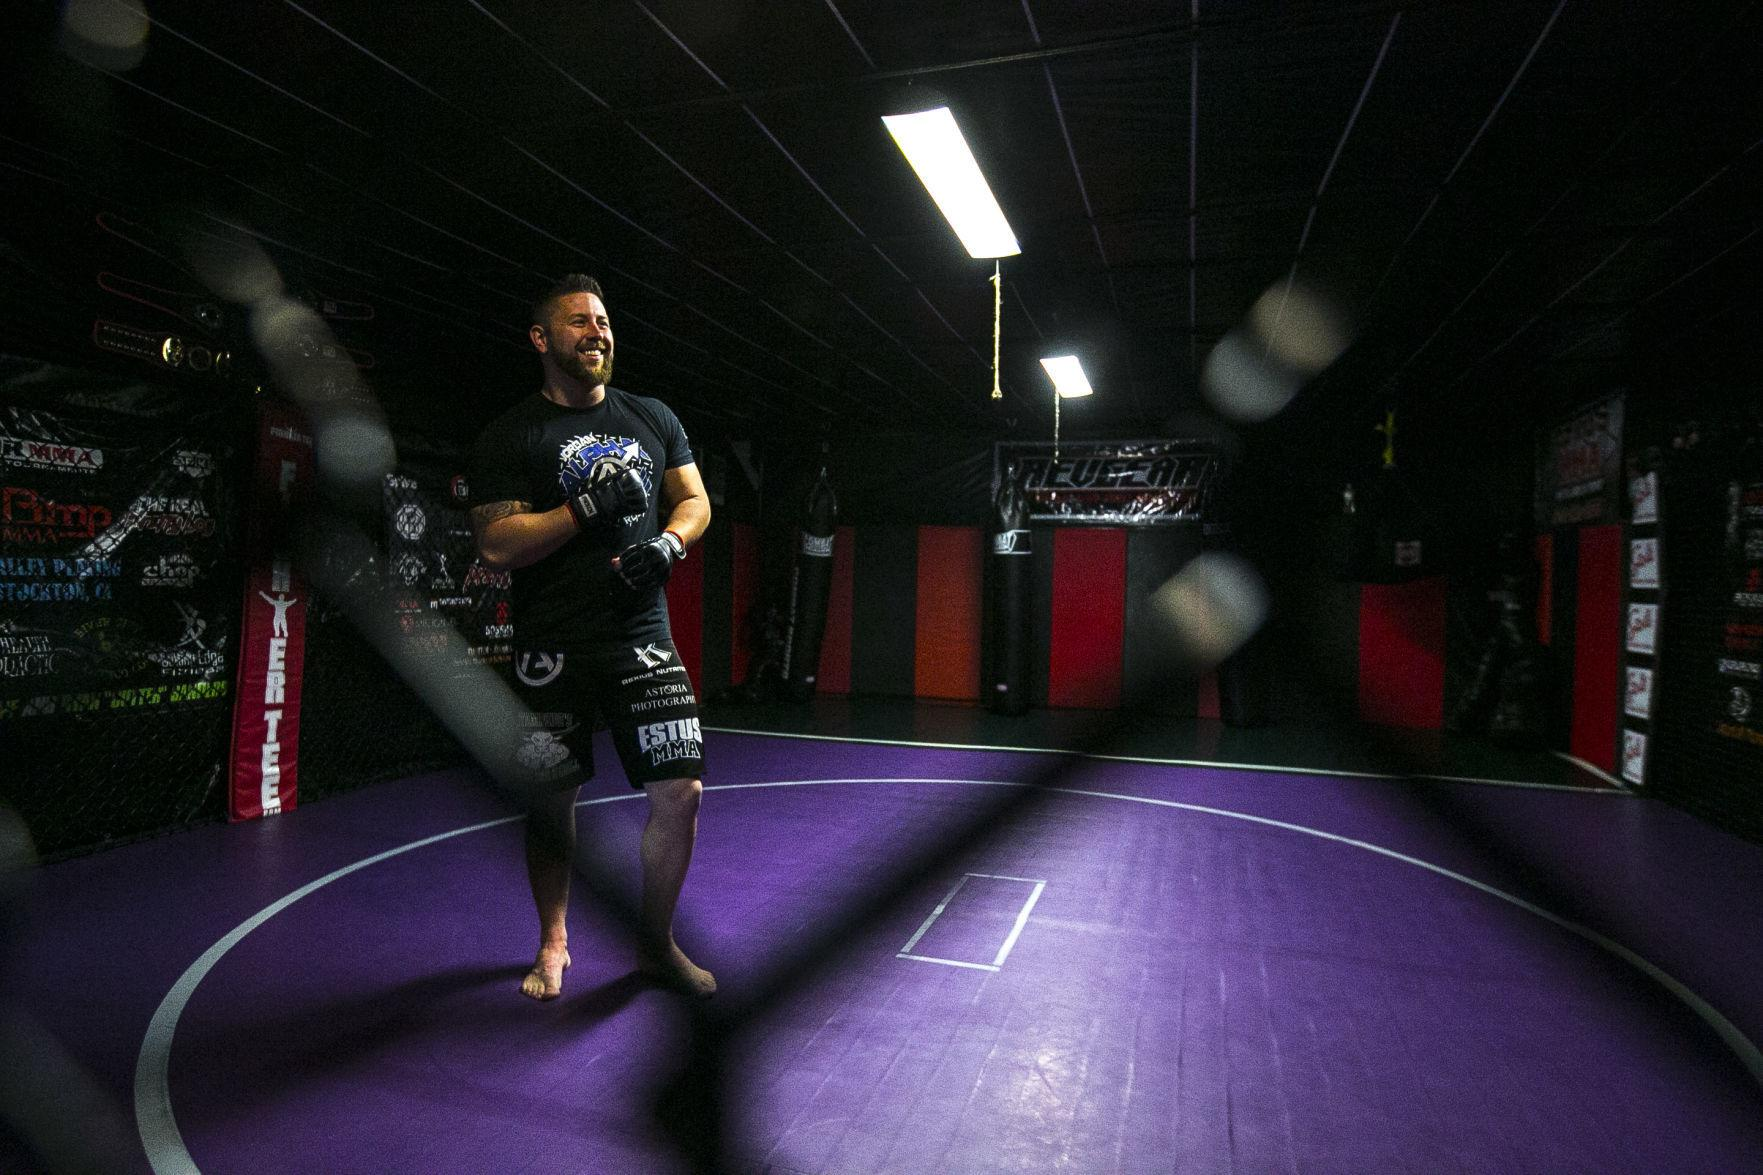 Mixed martial arts: Local fighter Jordan Rose highlights